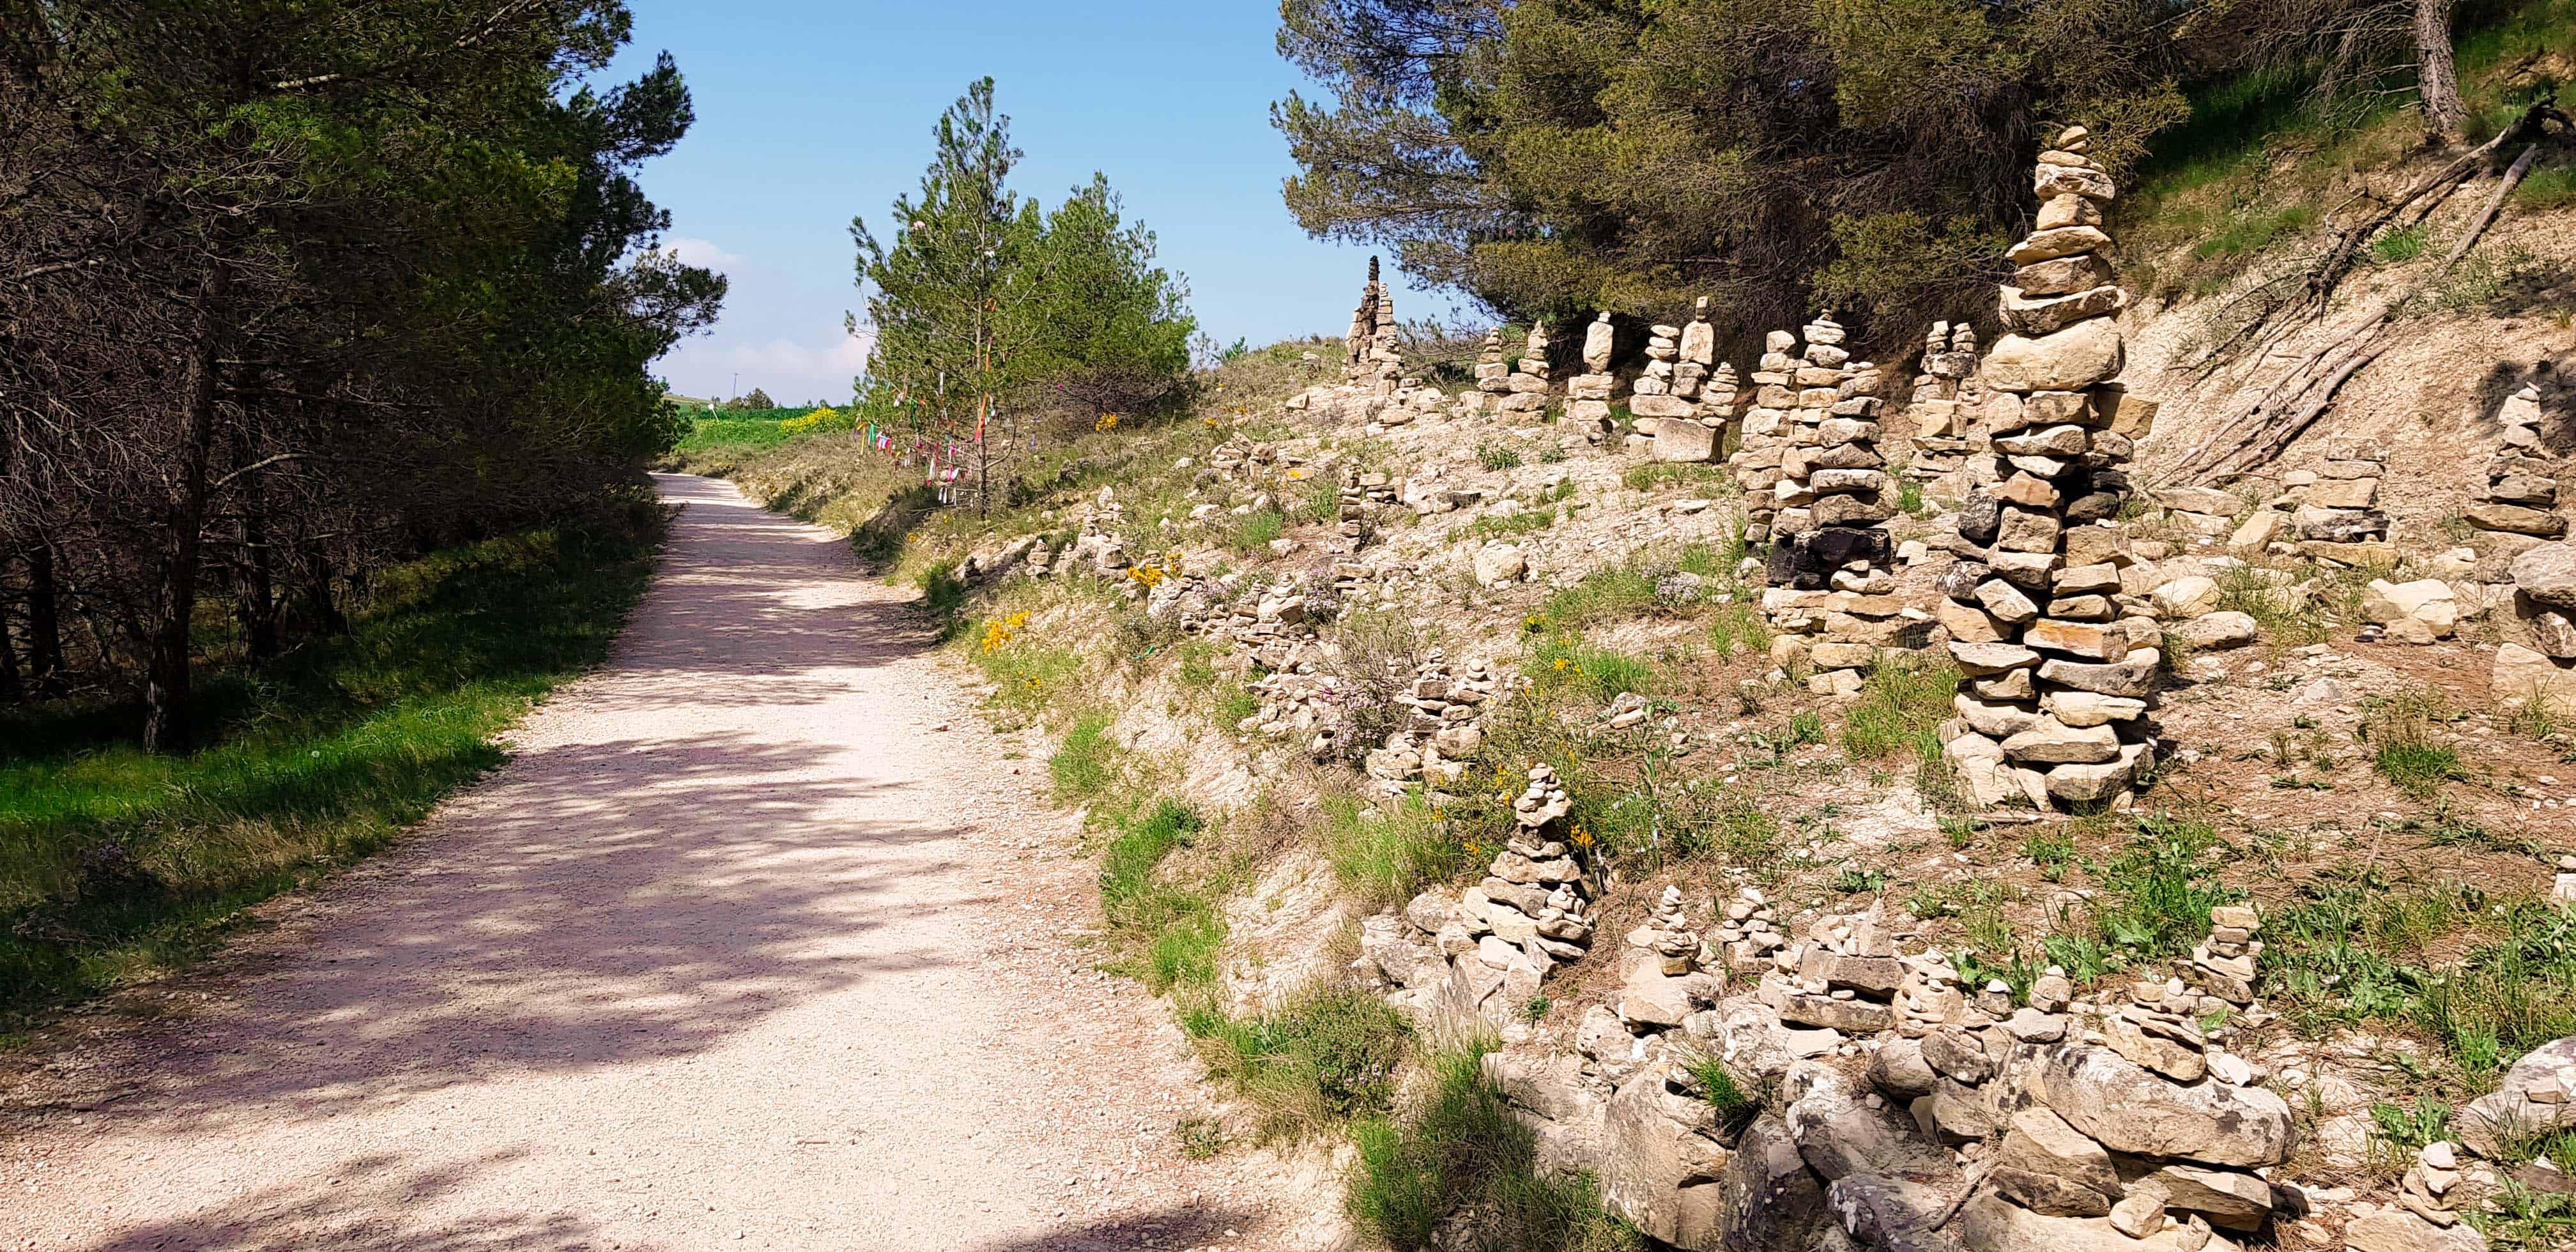 Mooie plekken onderweg - Camino Frances - HappyHikers